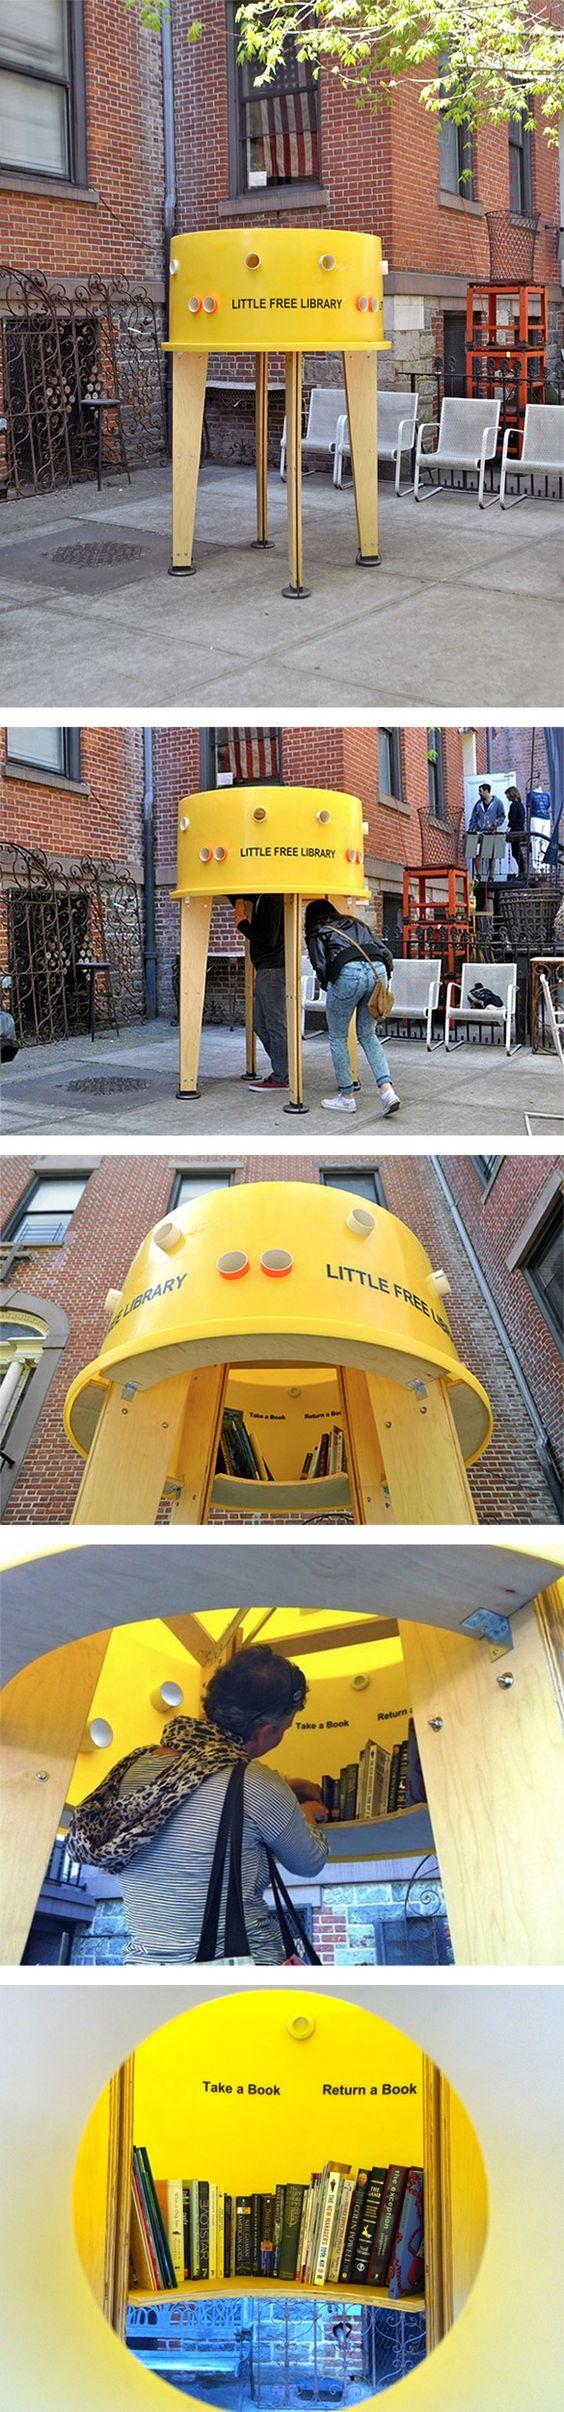 The Little Free Library : remettre les livres dans la rue ! #NewYork #Books #Sharing via graphism.fr